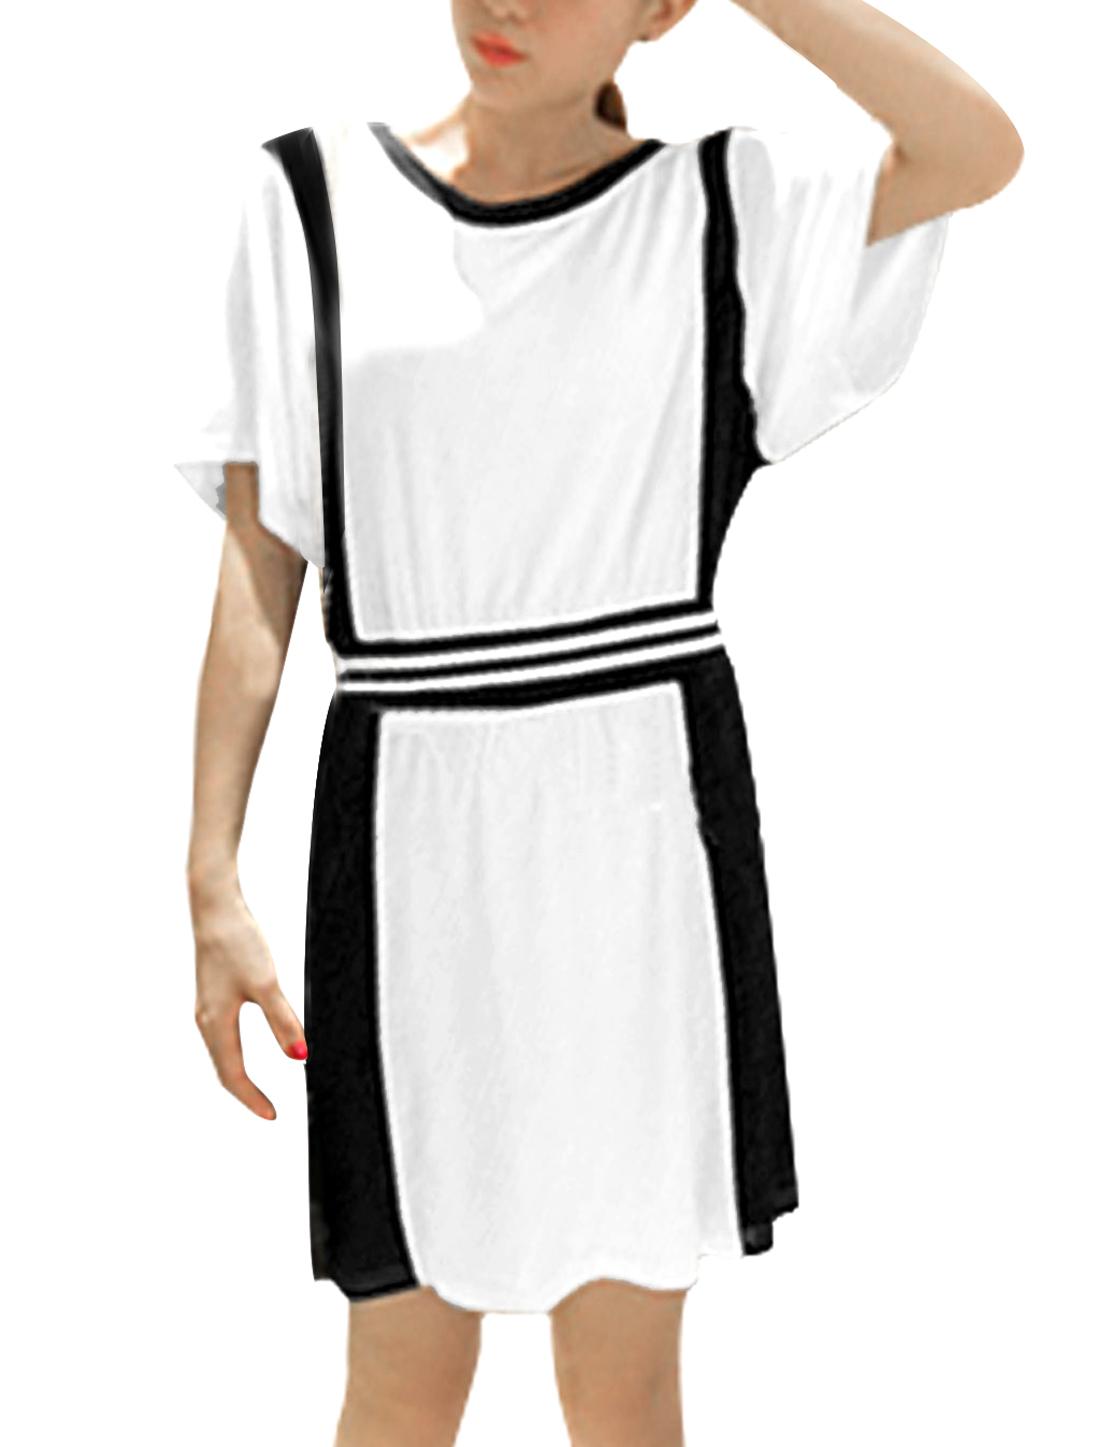 Lady Round Neck Short Sleeve Elastic Waist Colorblock Dress Black White S